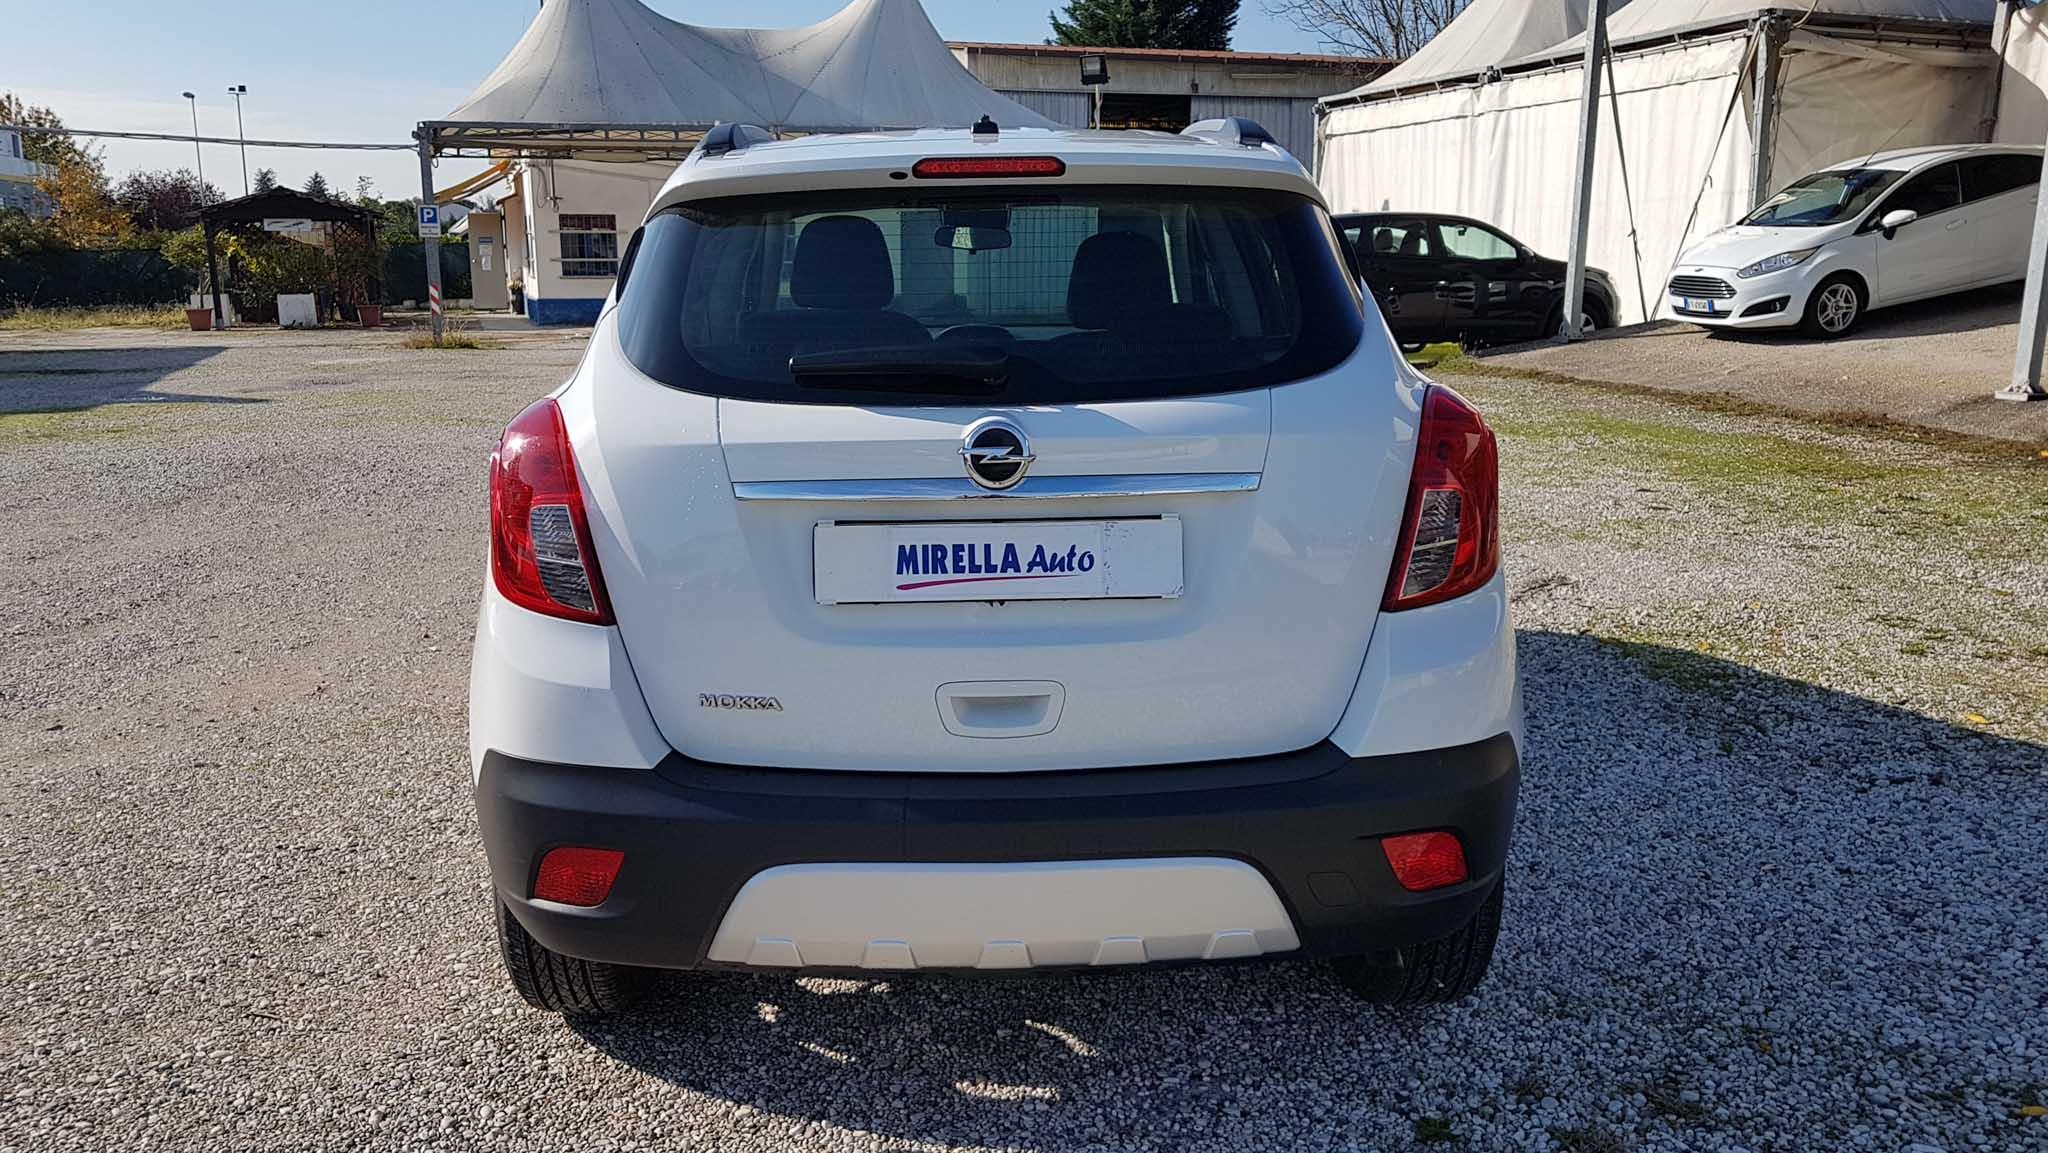 mokka-mirella-auto-8